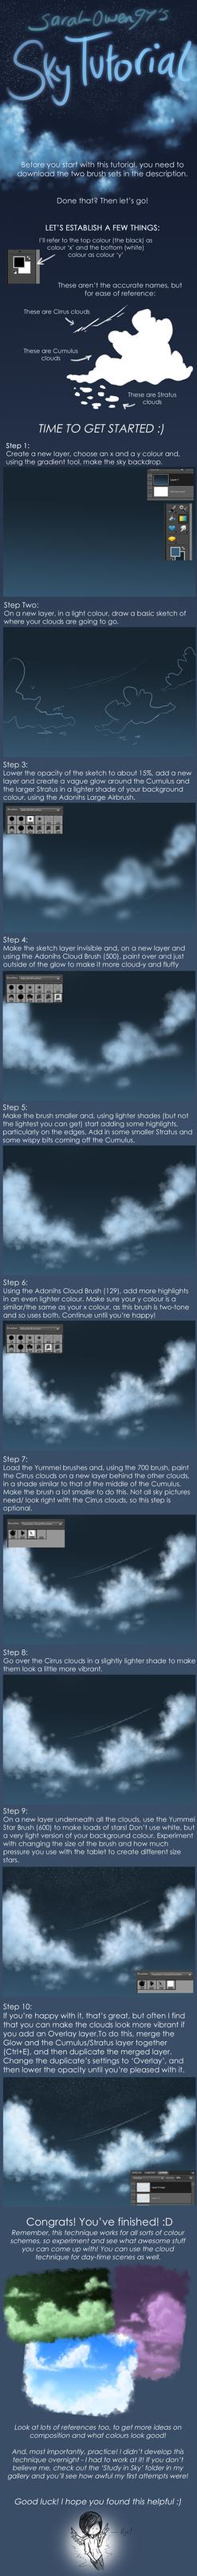 Sky Tutorial by sarahowen97